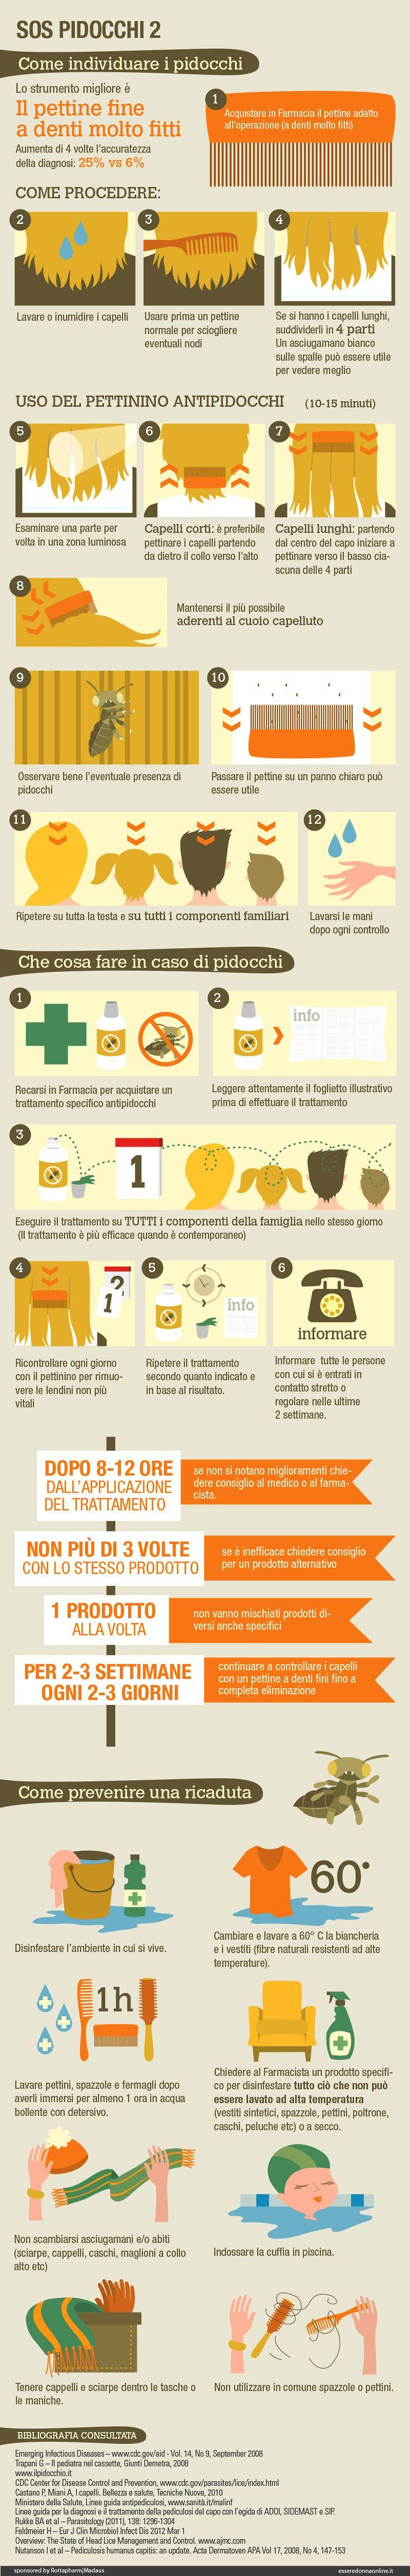 SOS Pidocchi 2 Infografica - esseredonnaonline